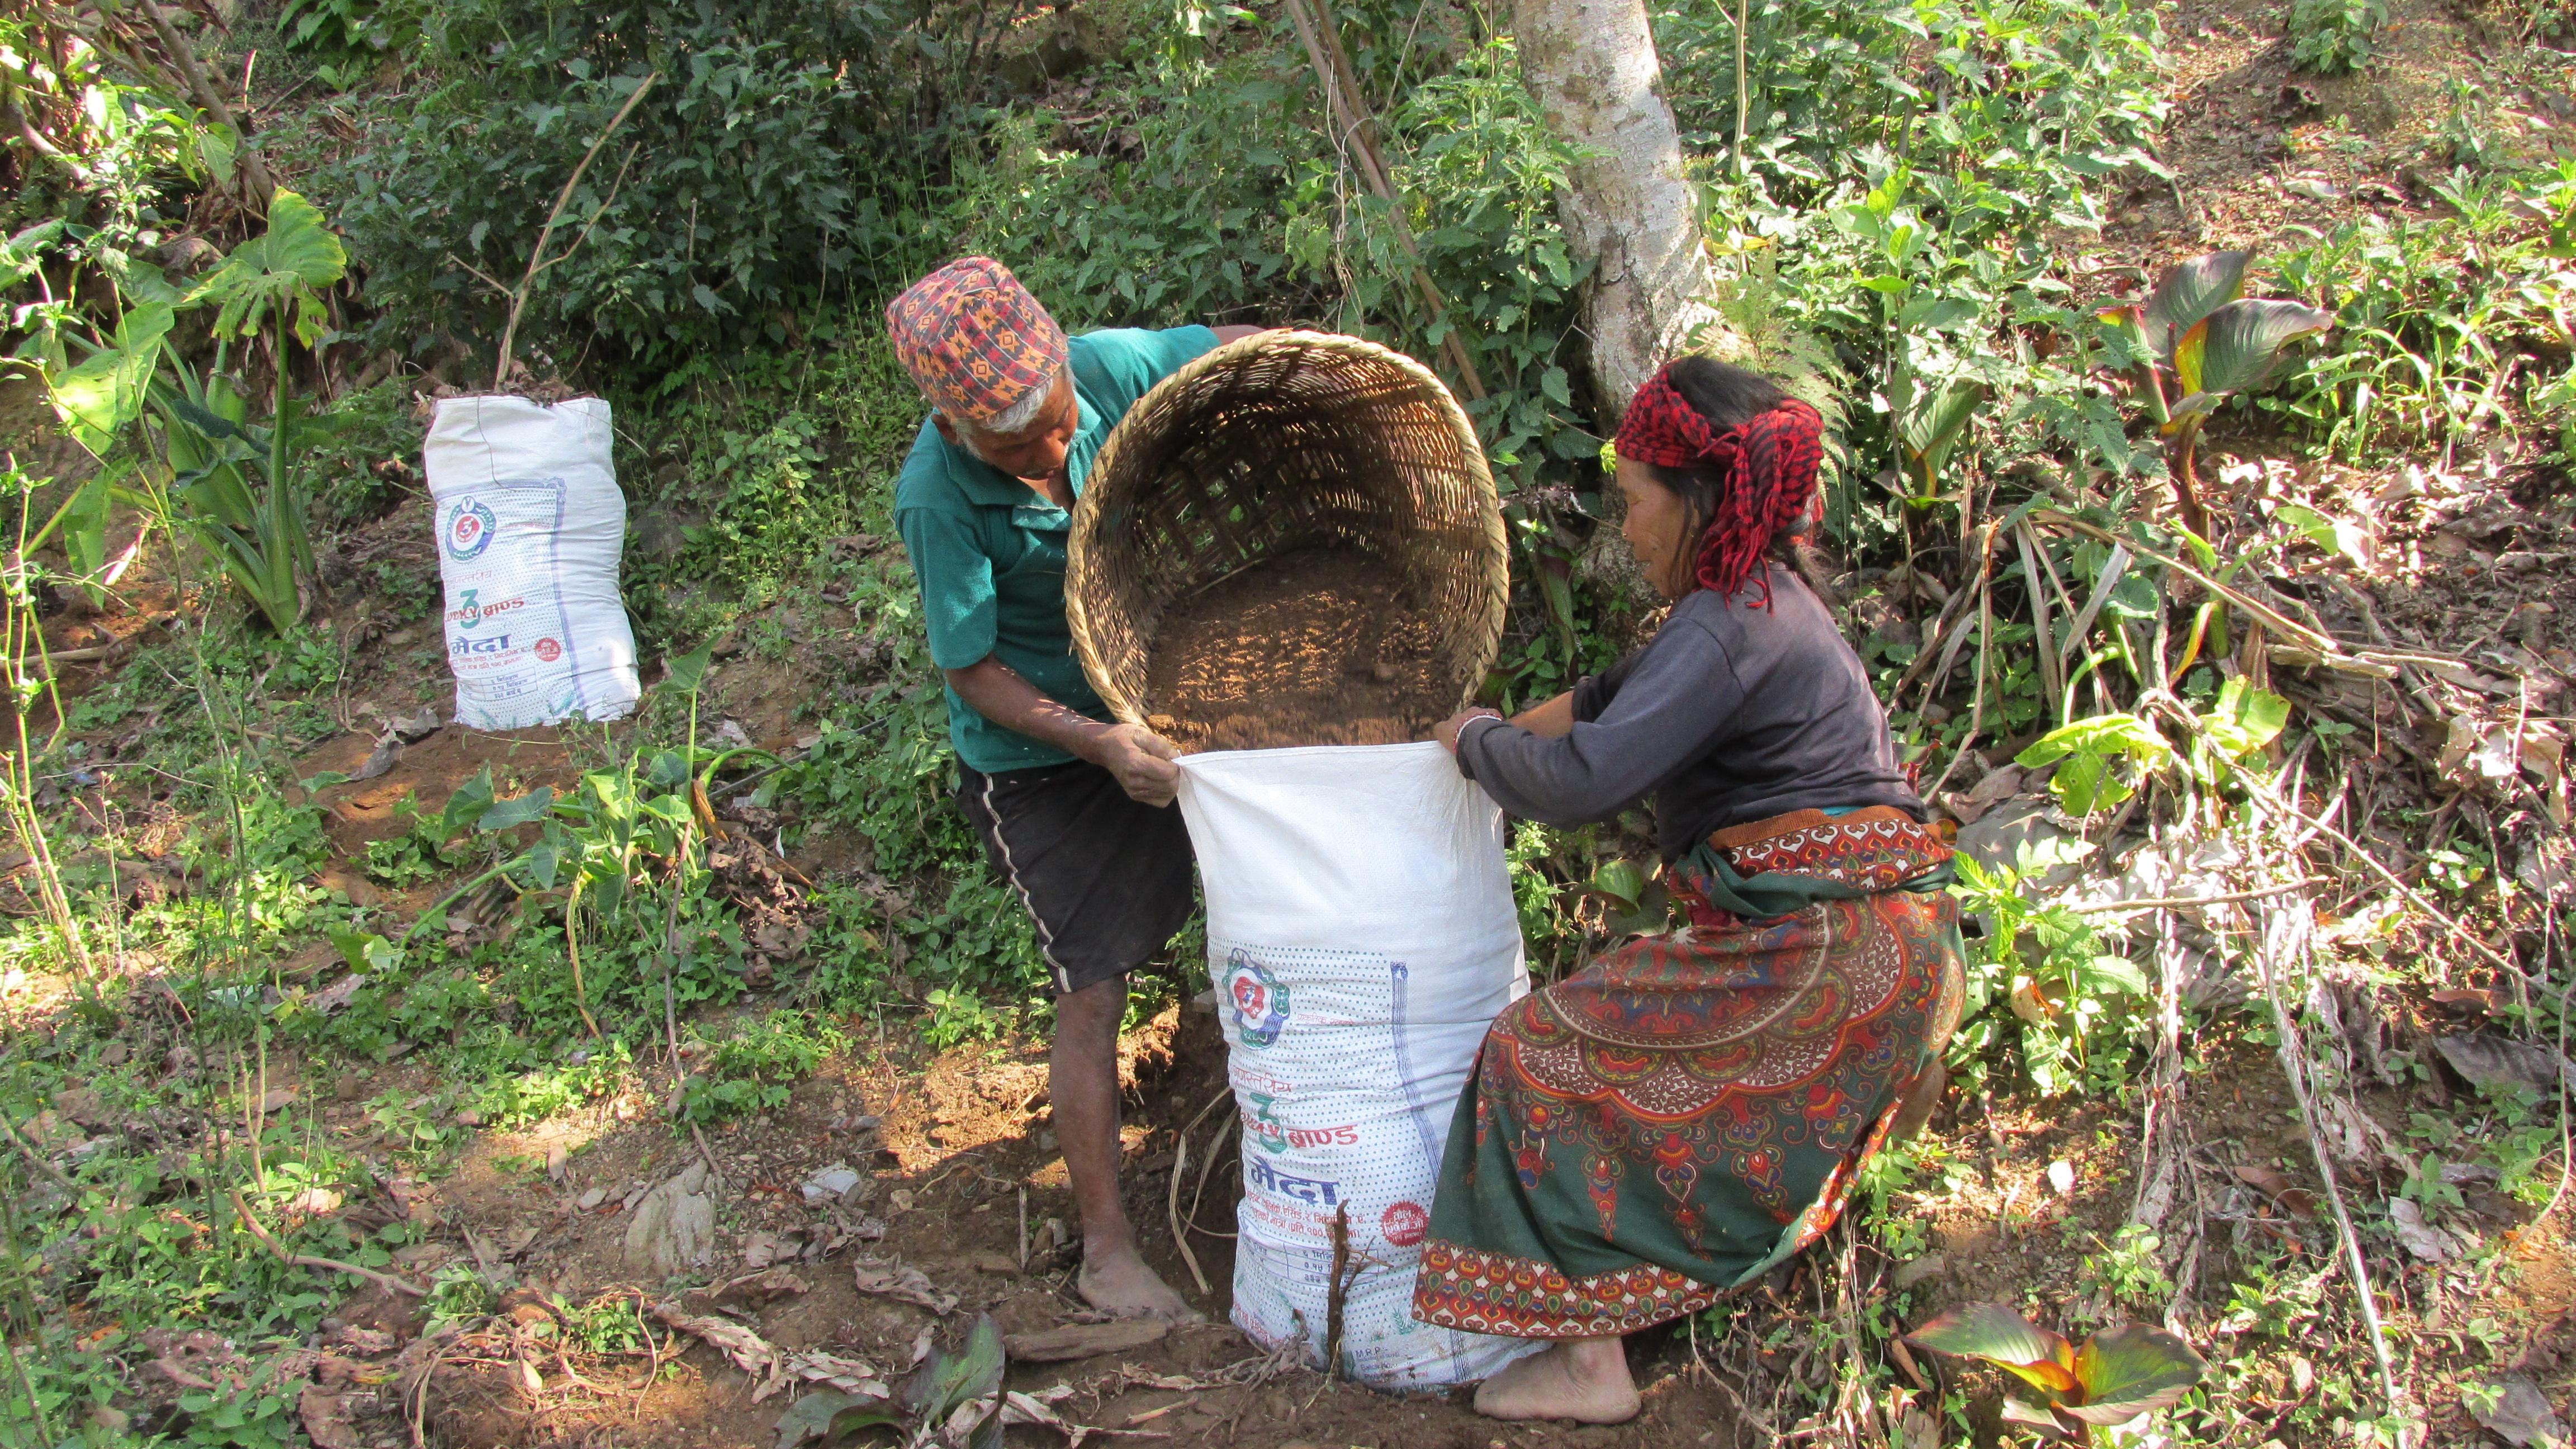 Preparation of sacks for transplanting yam